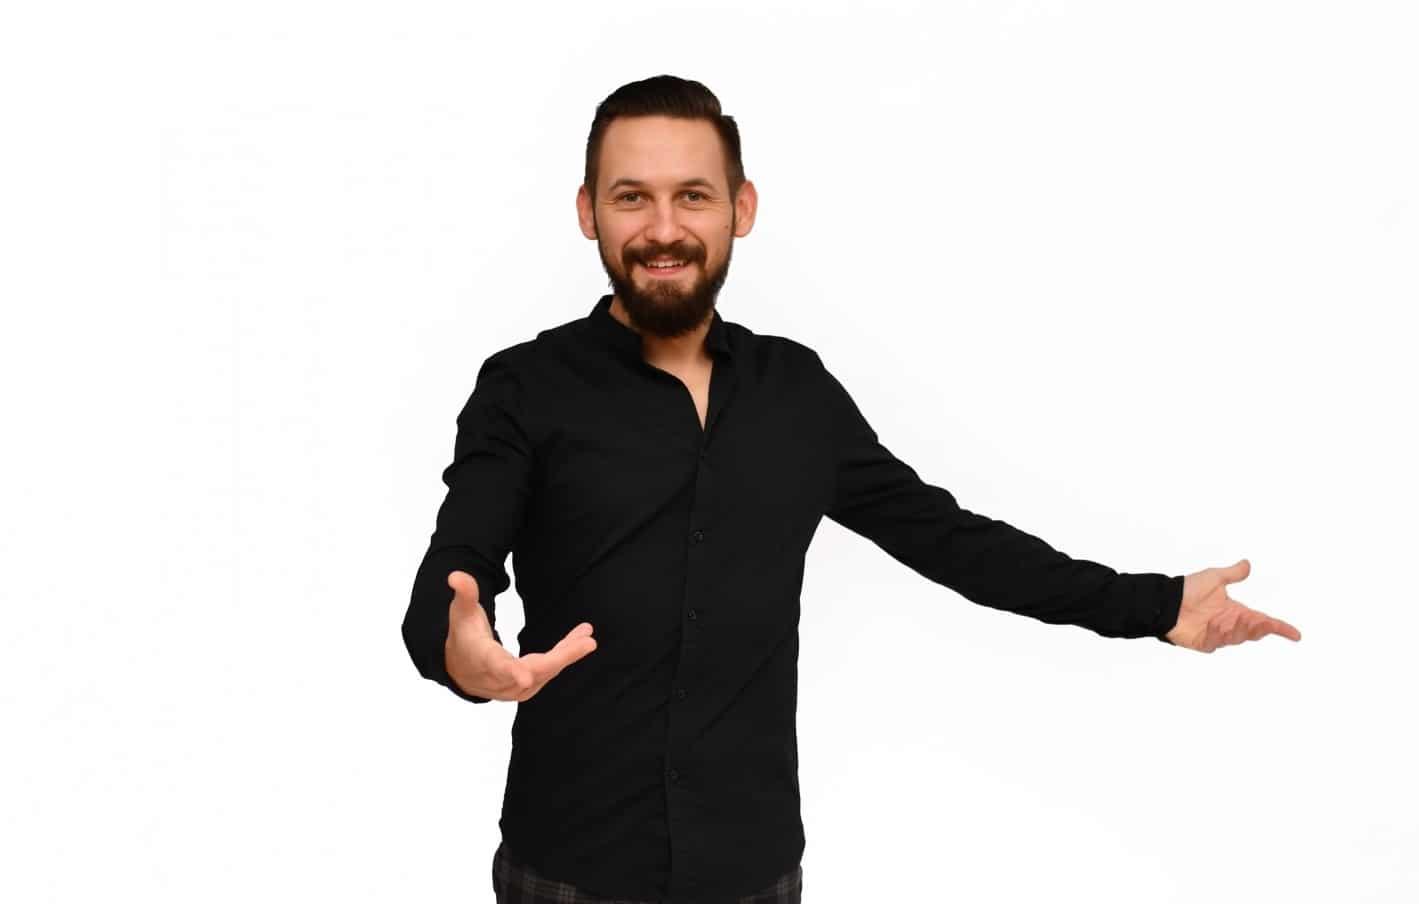 Marcin Łukasz Instruktor bachata w parach